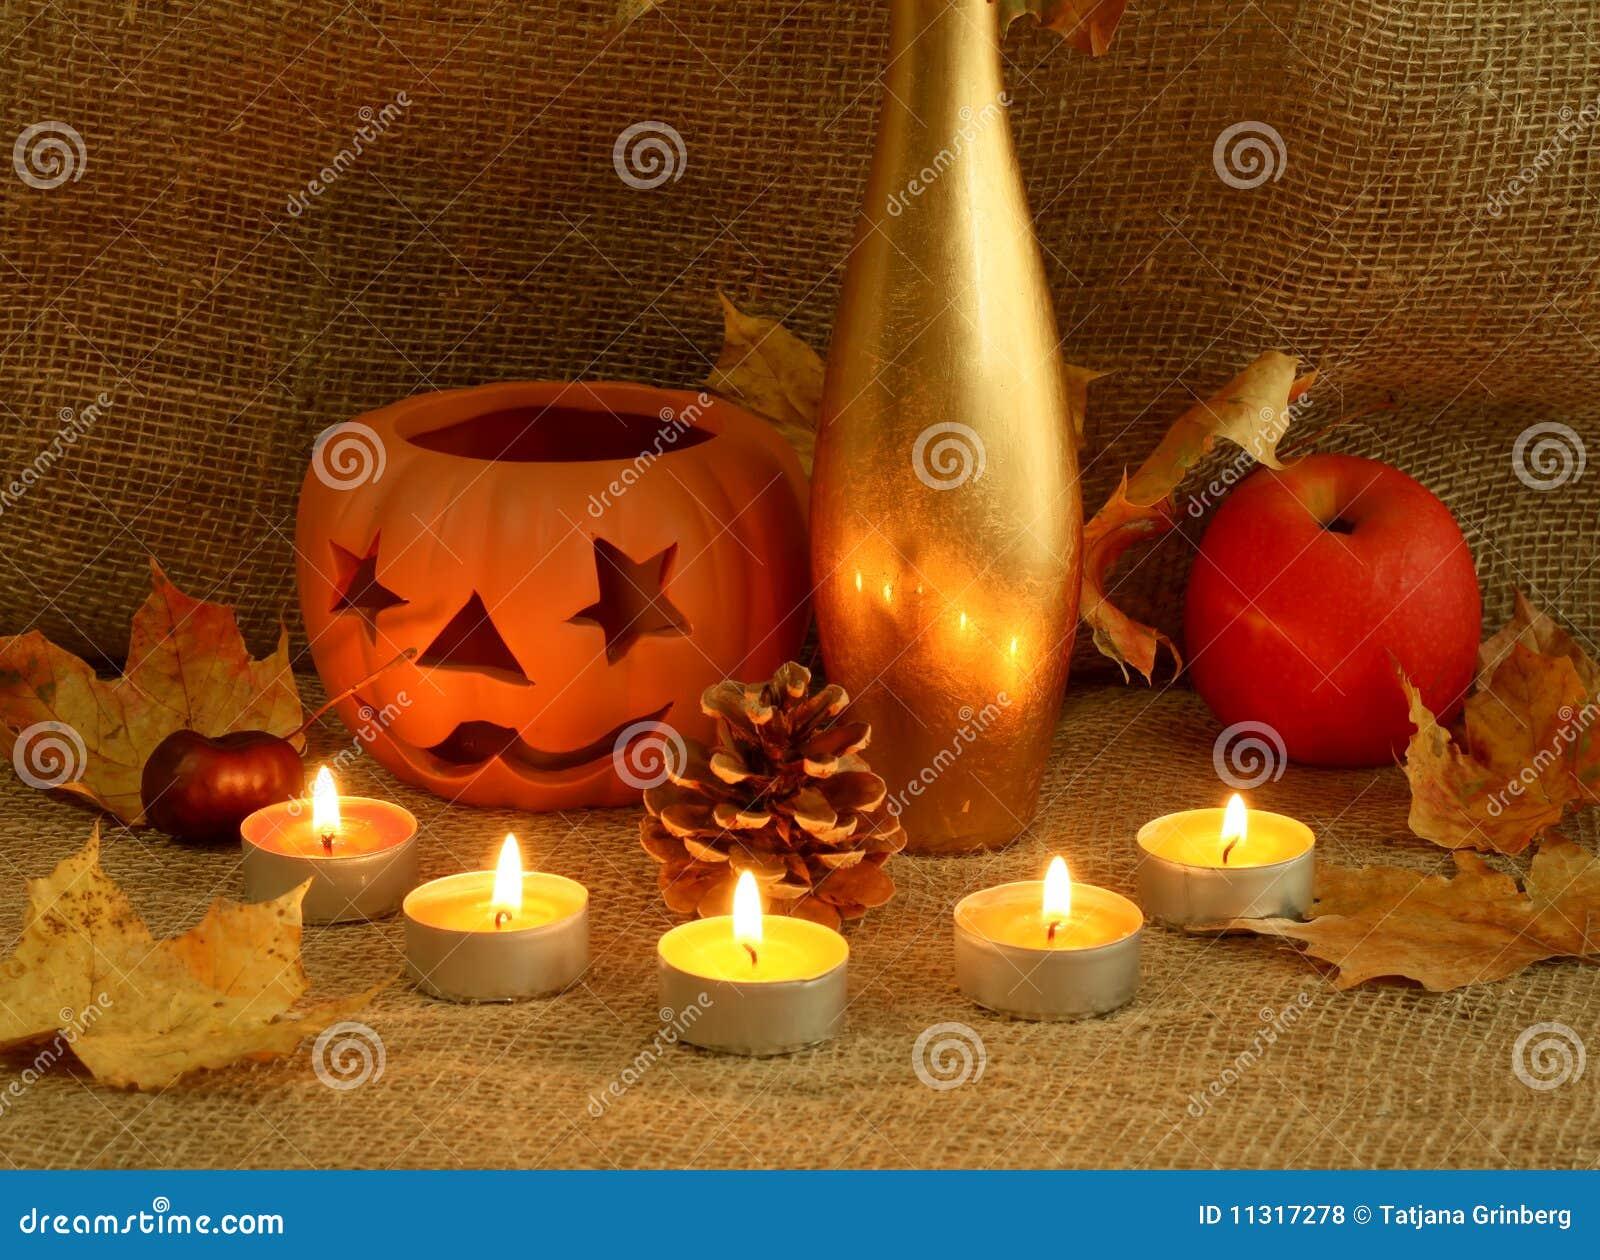 Kerzen, Lehmkerzenhalter, trockene Blätter und Apfel.